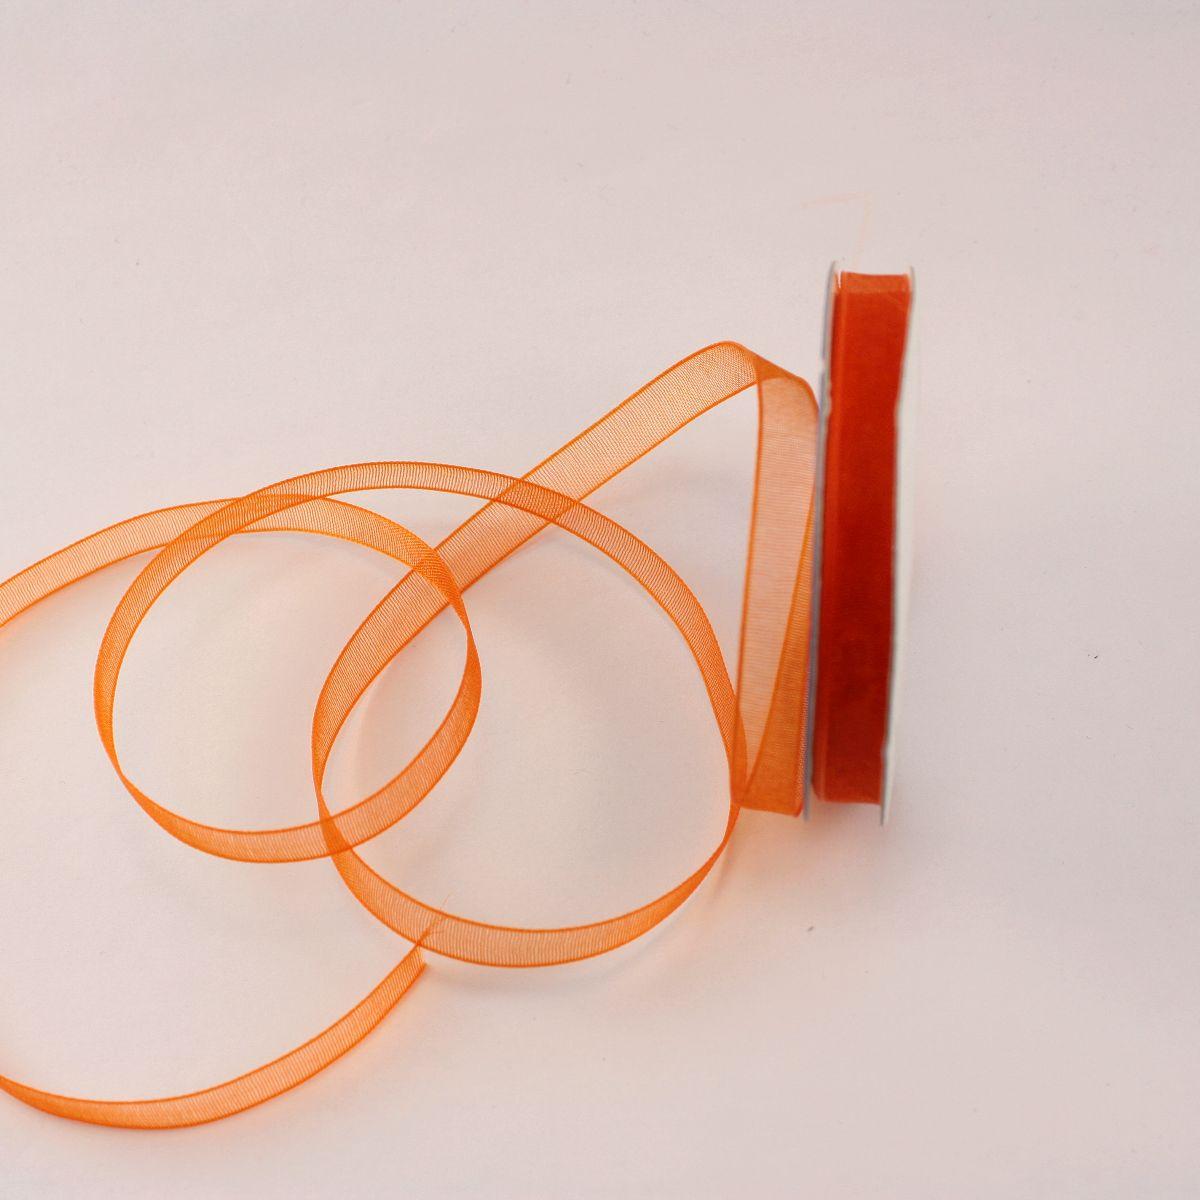 Ruban organdi en bobine orange sanguine 6 mm